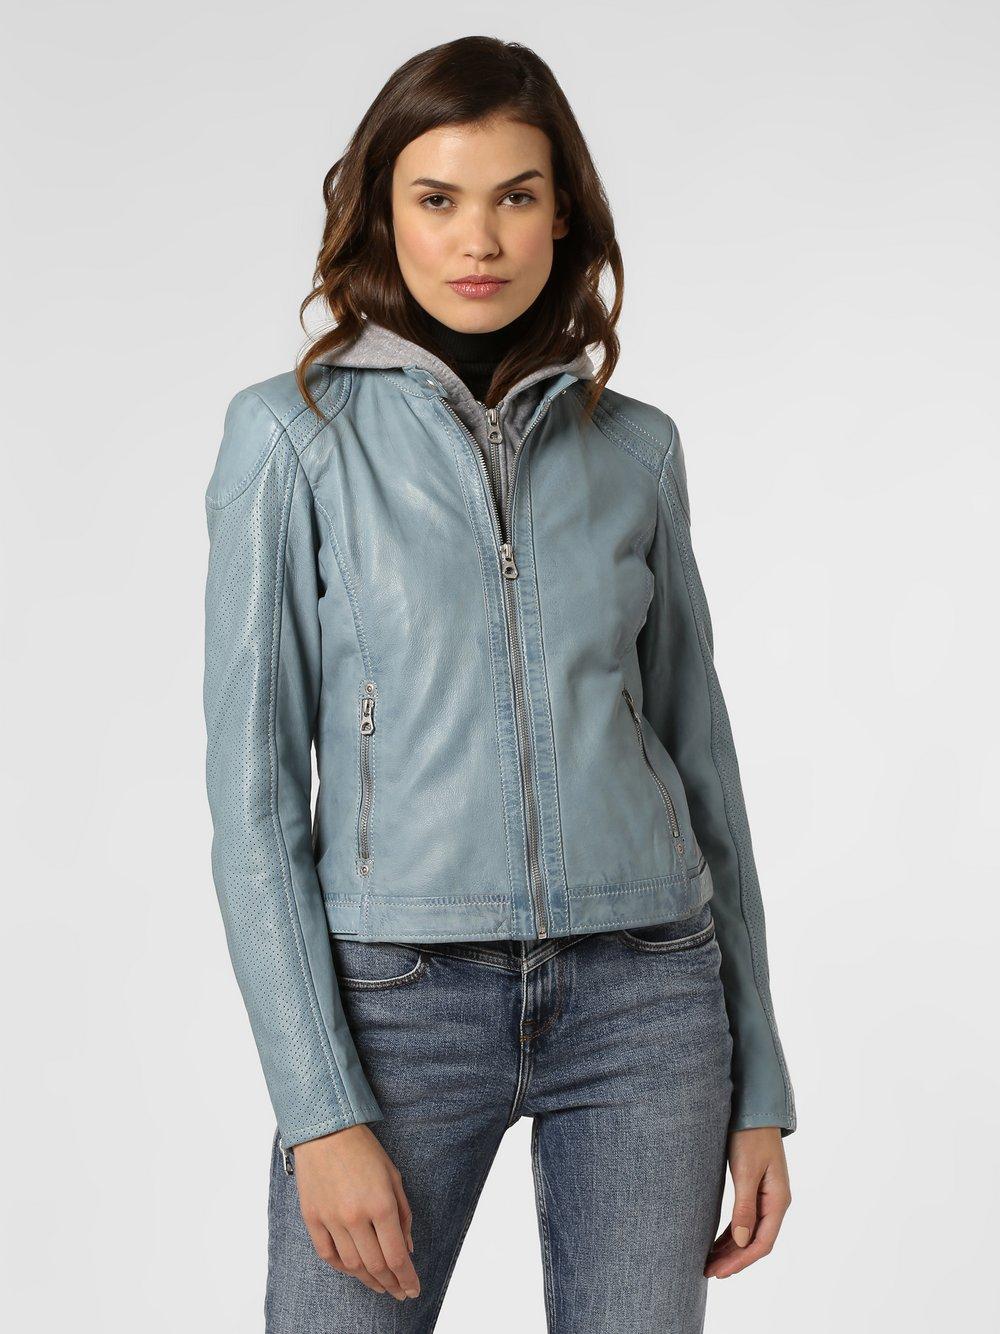 Gipsy – Damska kurtka skórzana – Aelly Lamas, niebieski Van Graaf 463901-0001